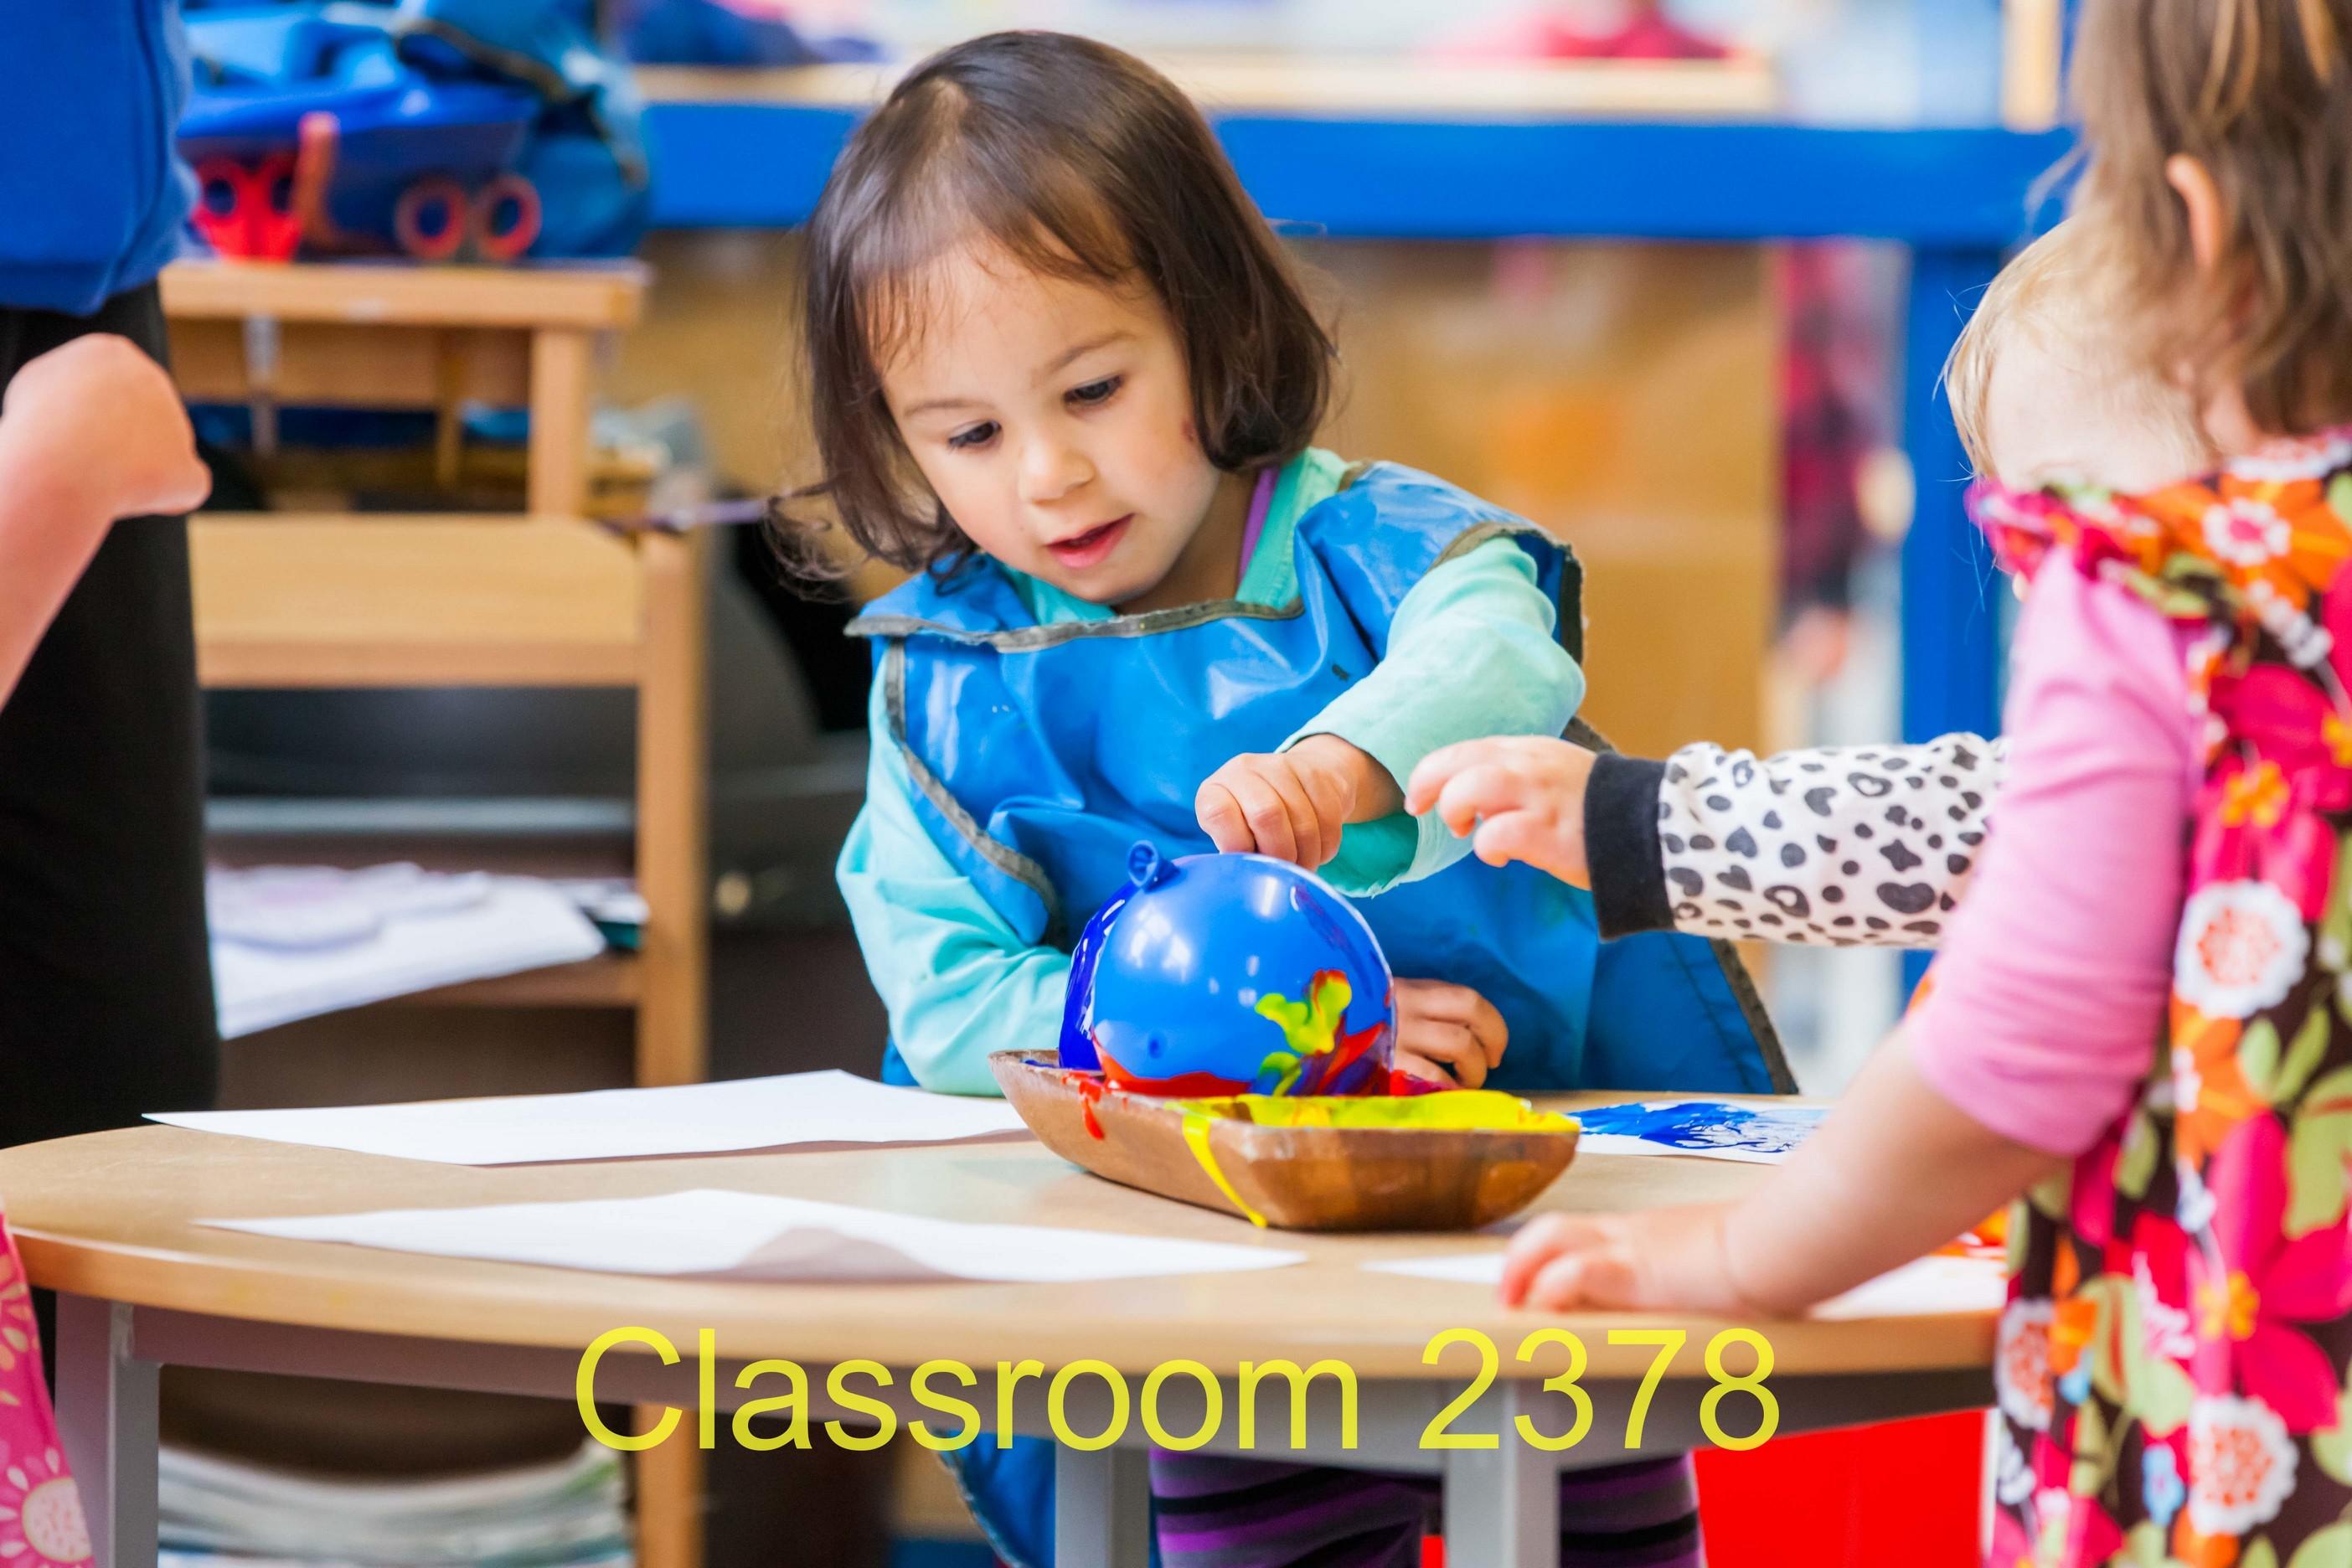 Classroom 2378